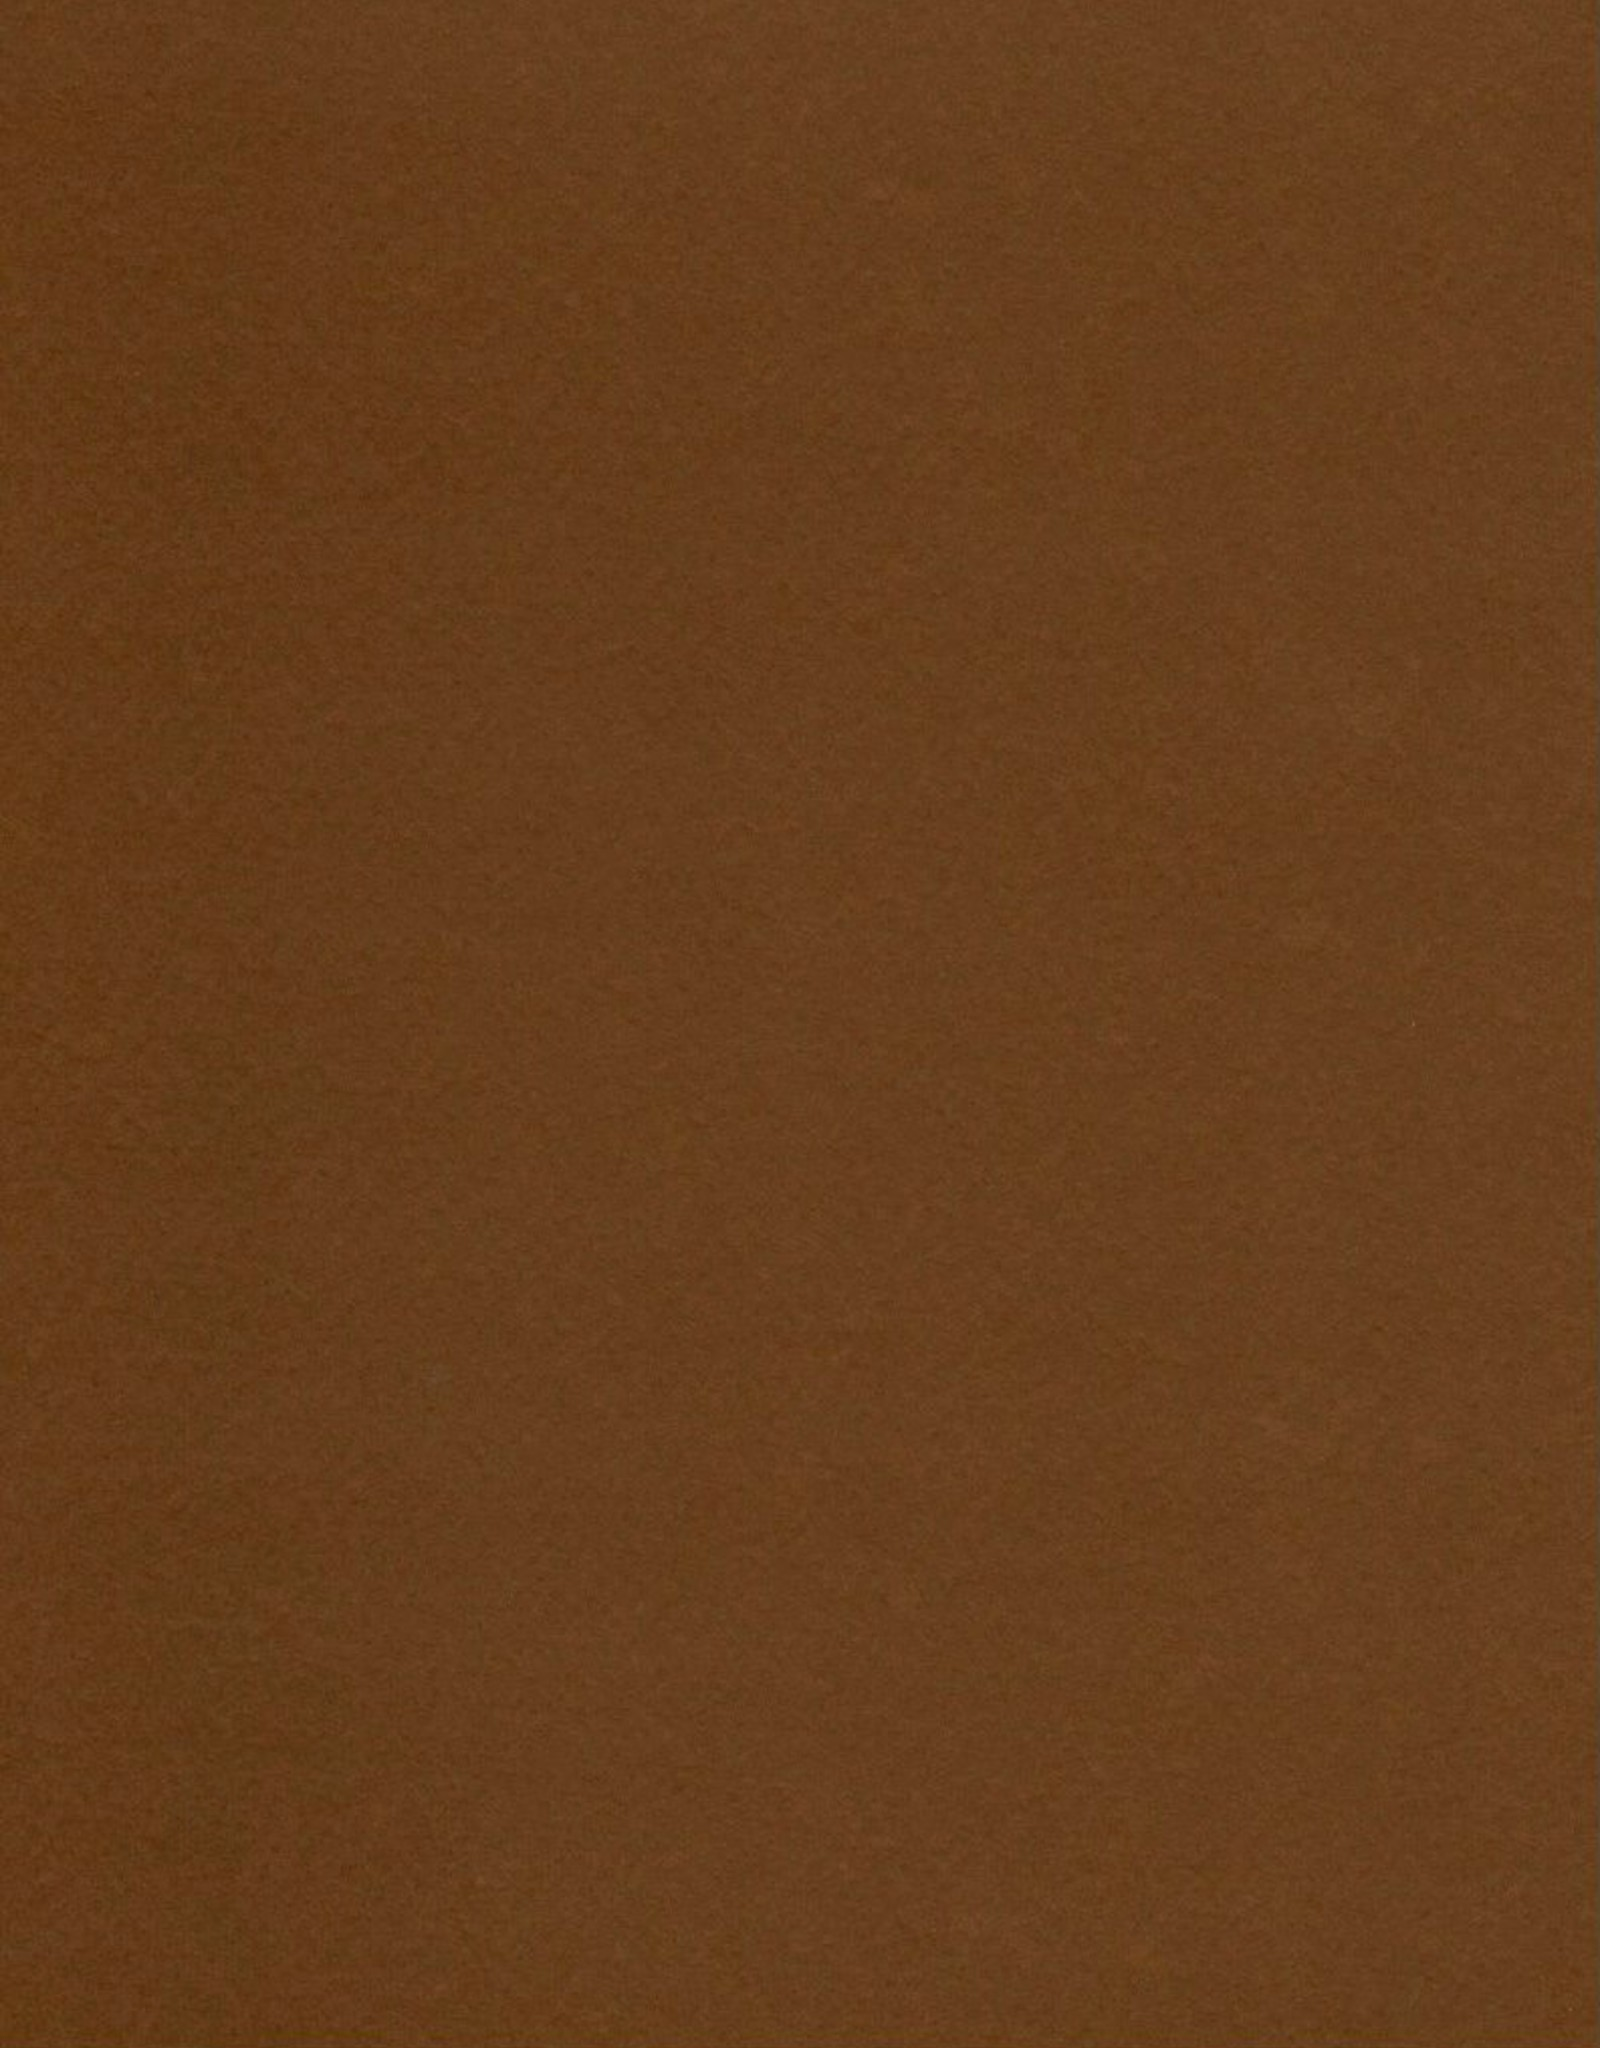 "Fabriano Vice Versa (Elle Erre), Brown, 20"" x 27.5"", 220gsm / 135#"